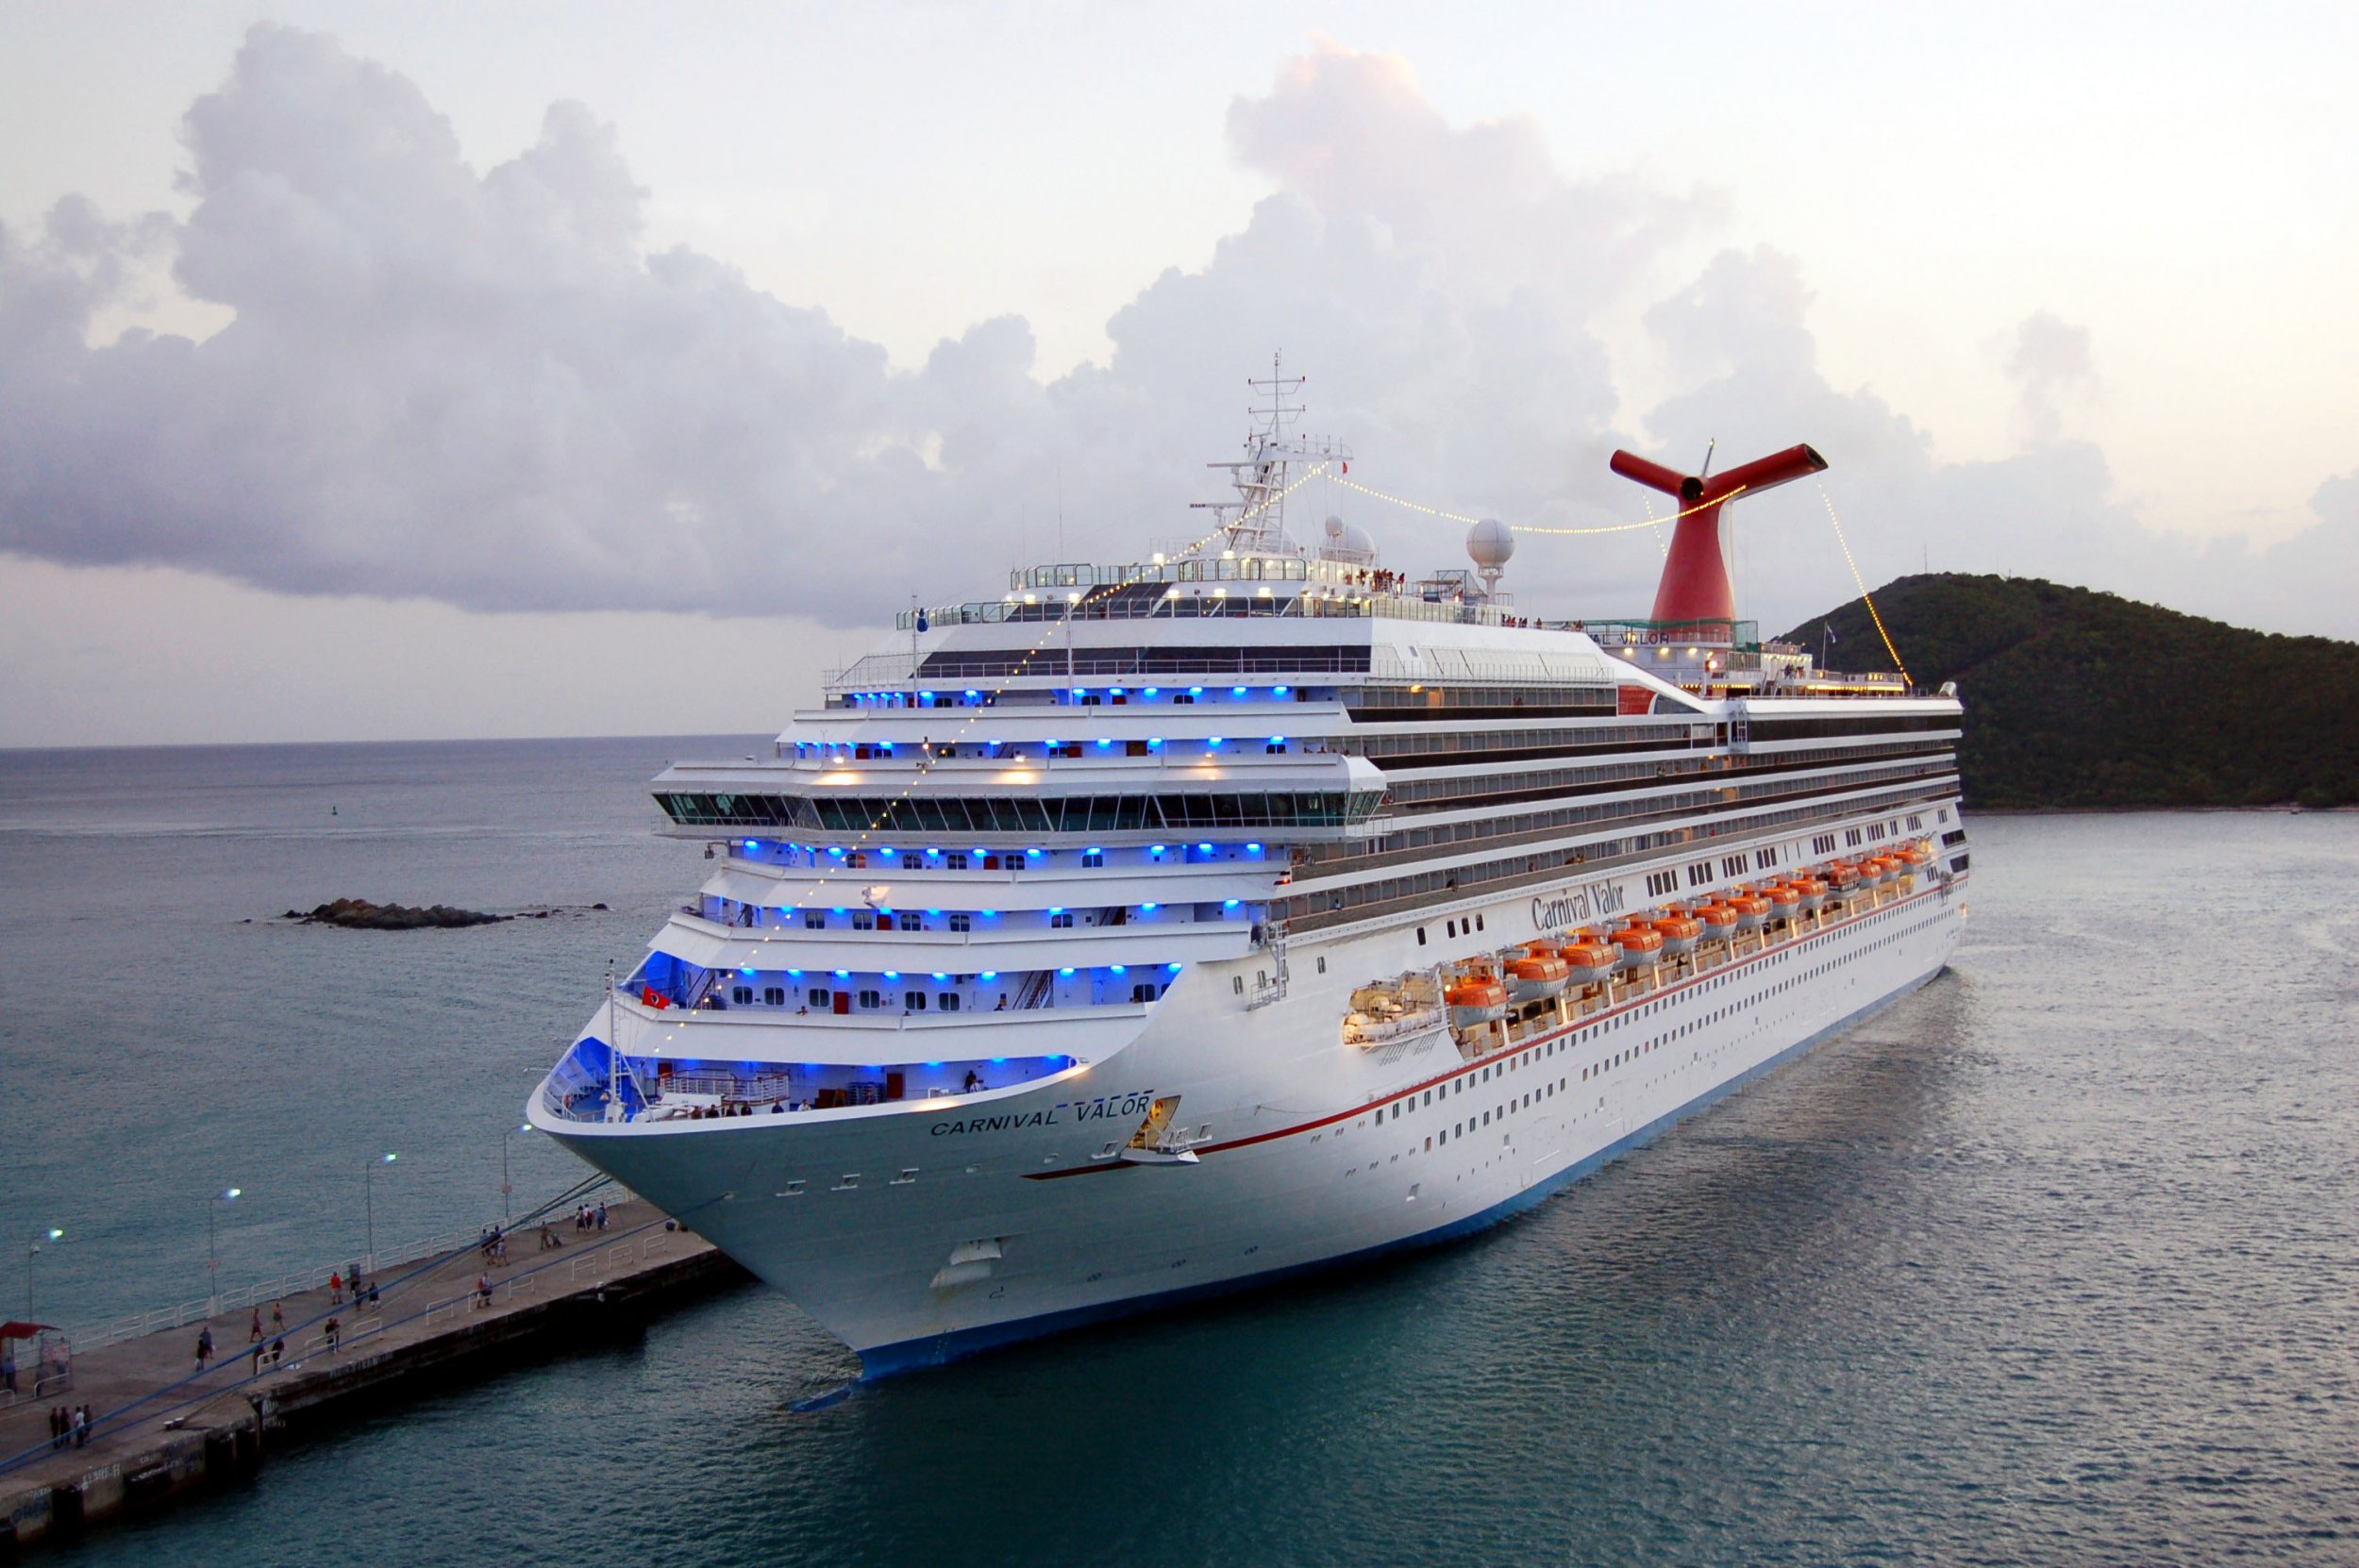 Carnival Valor, Cruise Ship, Lost At Sea, Cruise, Texas, Caribbean, Mexico